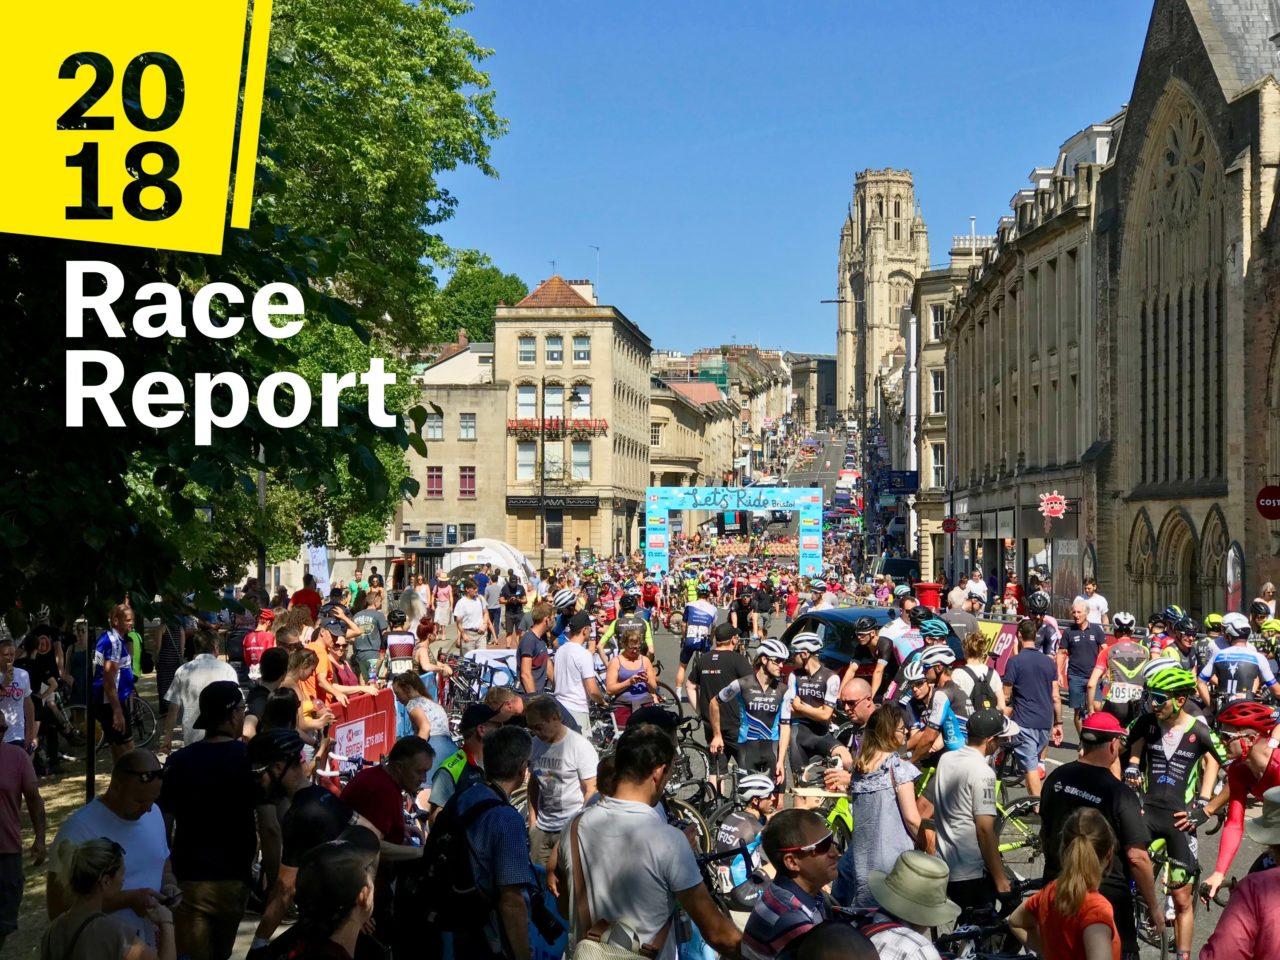 Race Report 2018